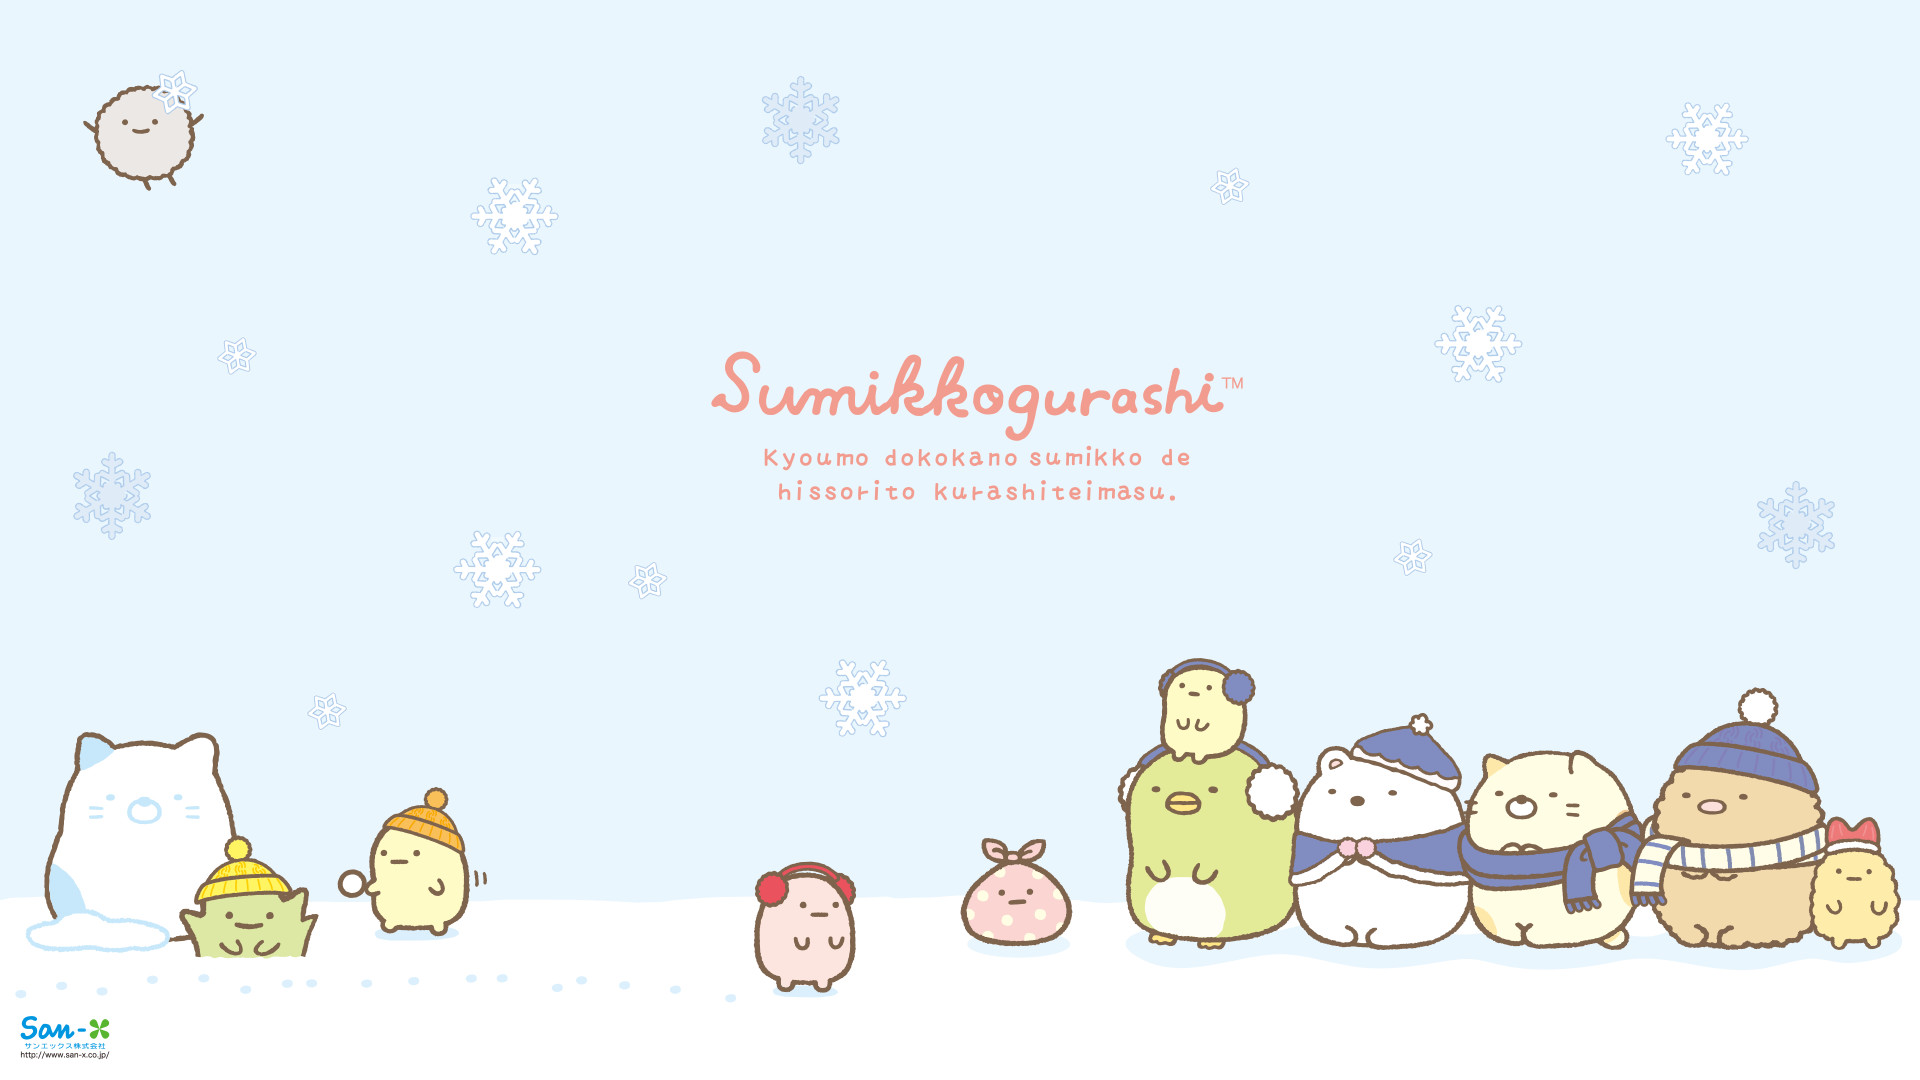 Cute Kawaii Wallpaper for iPhone (82+ images)